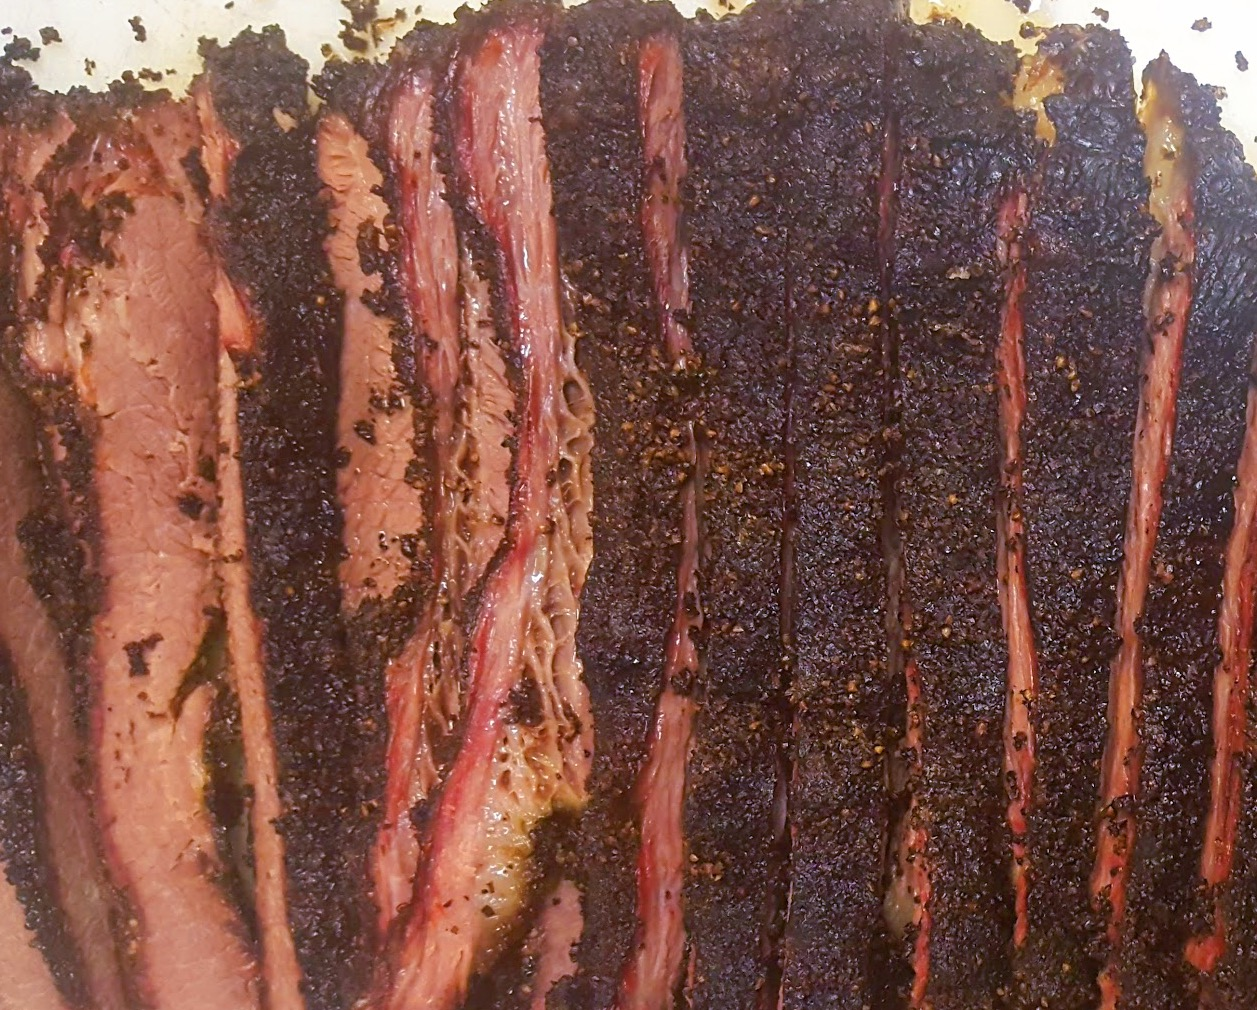 Sliced Texas BBQ brisket.